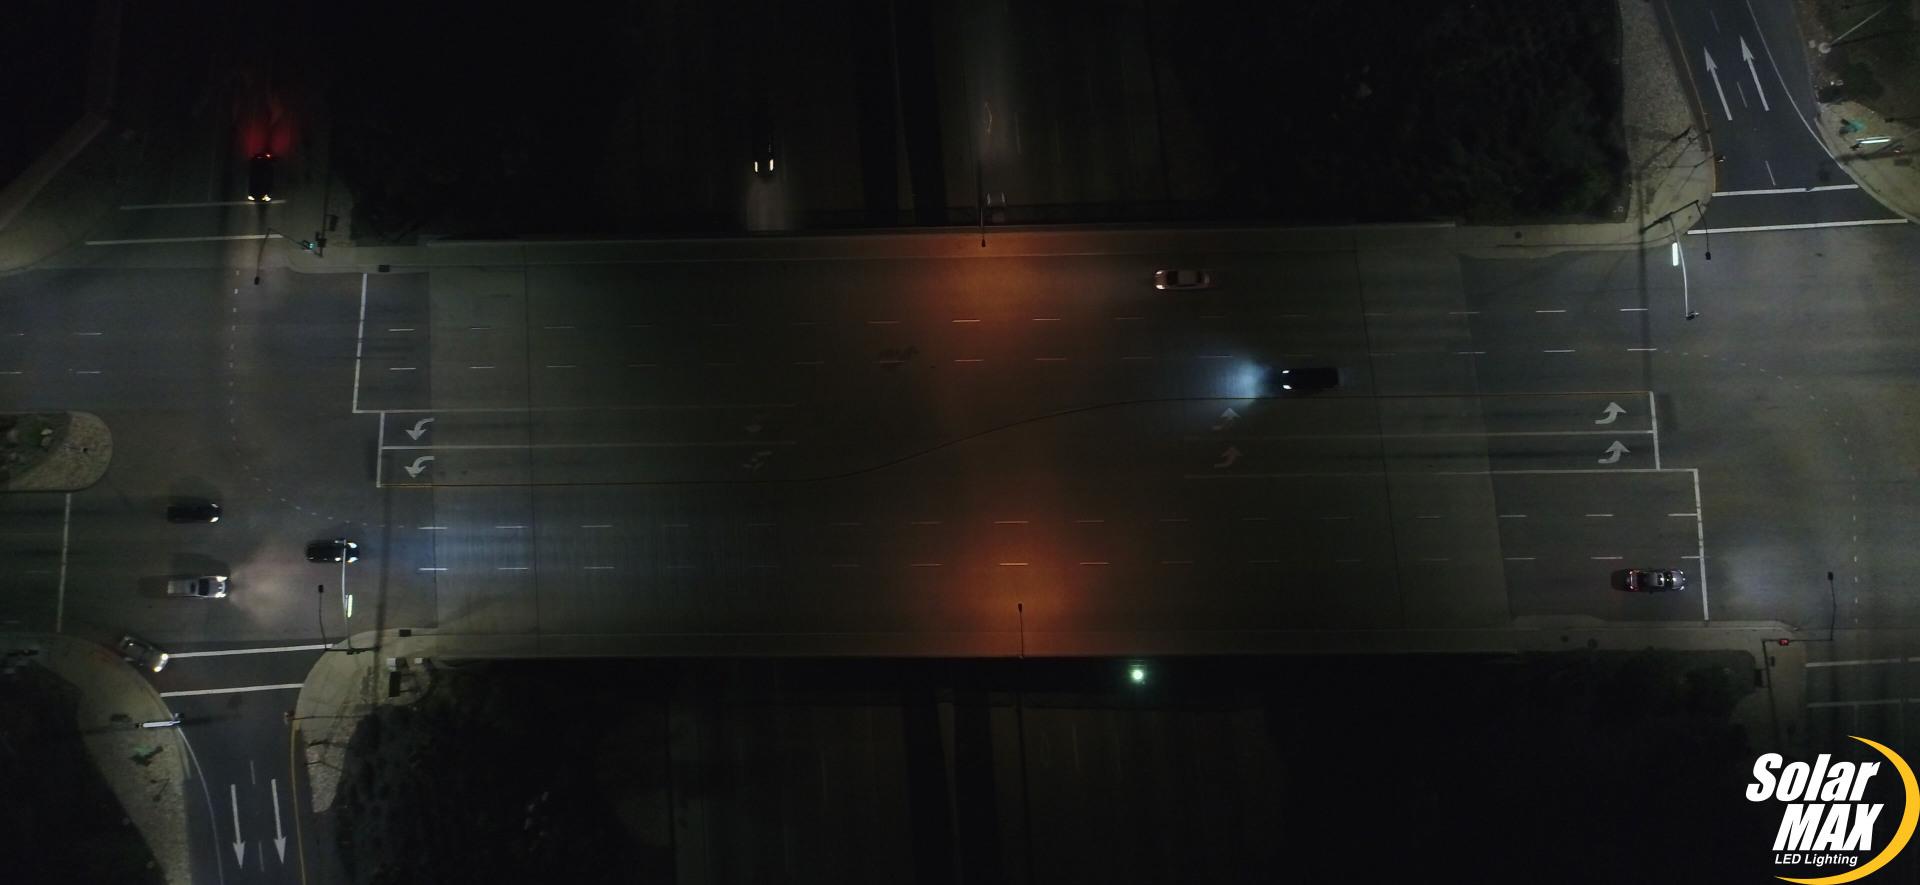 RDC4IT SOLARMAX LED TECH CALTRANS LIGHT BEFORE AFTER DRONE